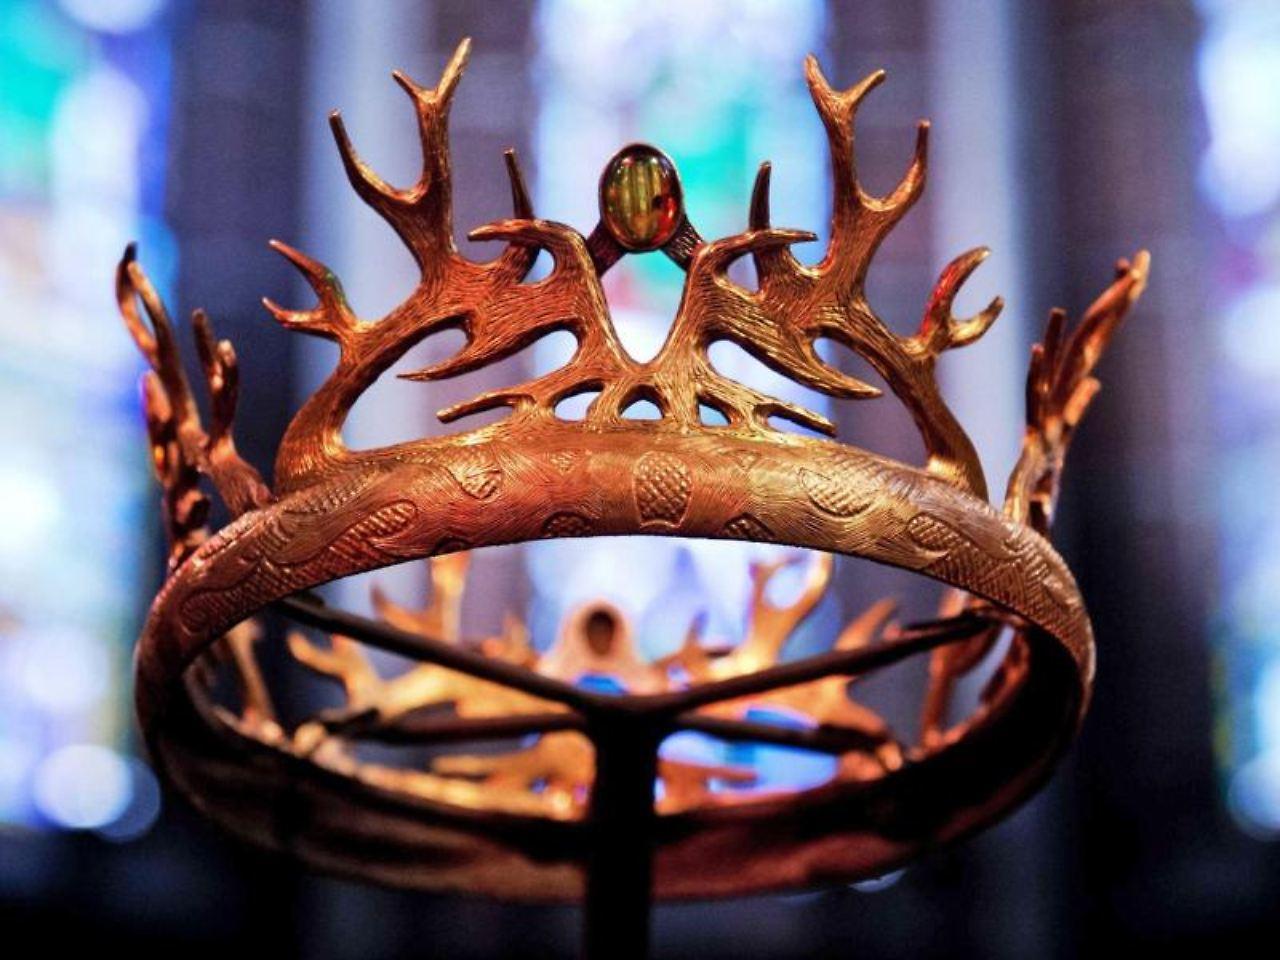 Best Game Of Thrones Interieur Ideen Photos - New Home Design 2018 ...